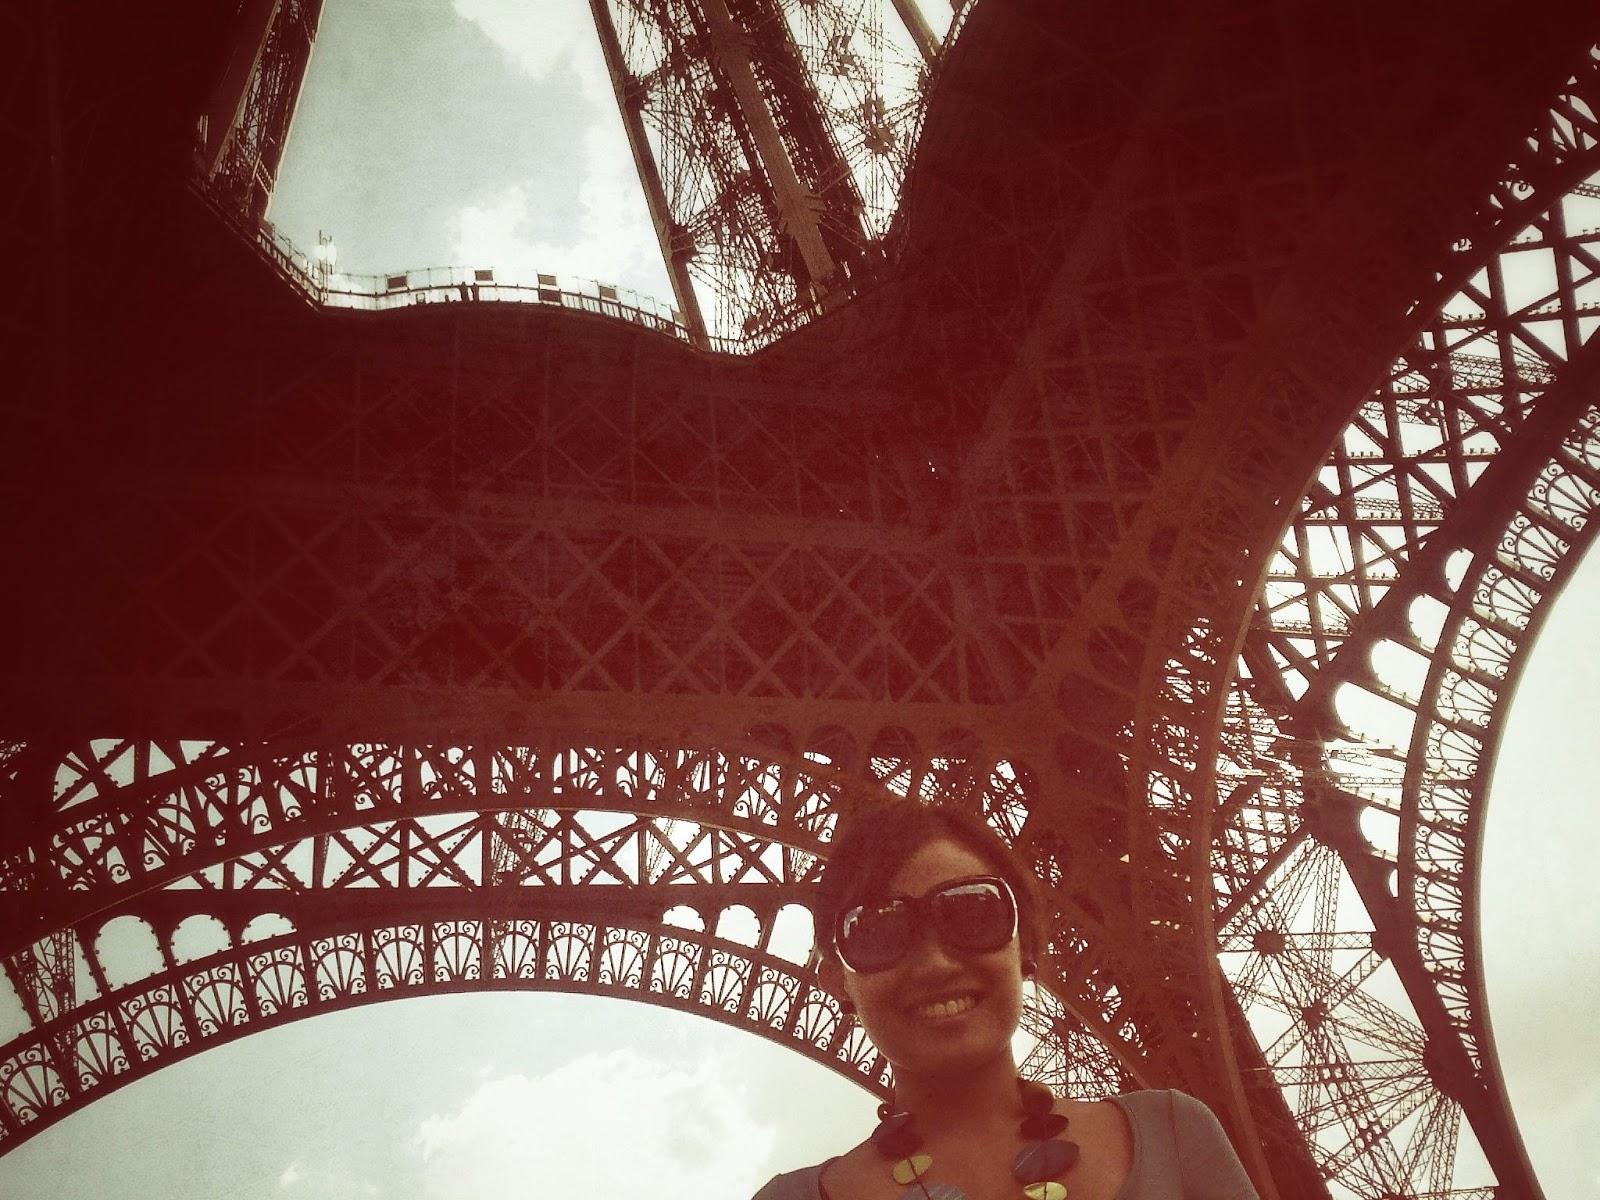 Paris, Eiffel tower, Europe, travel, blog